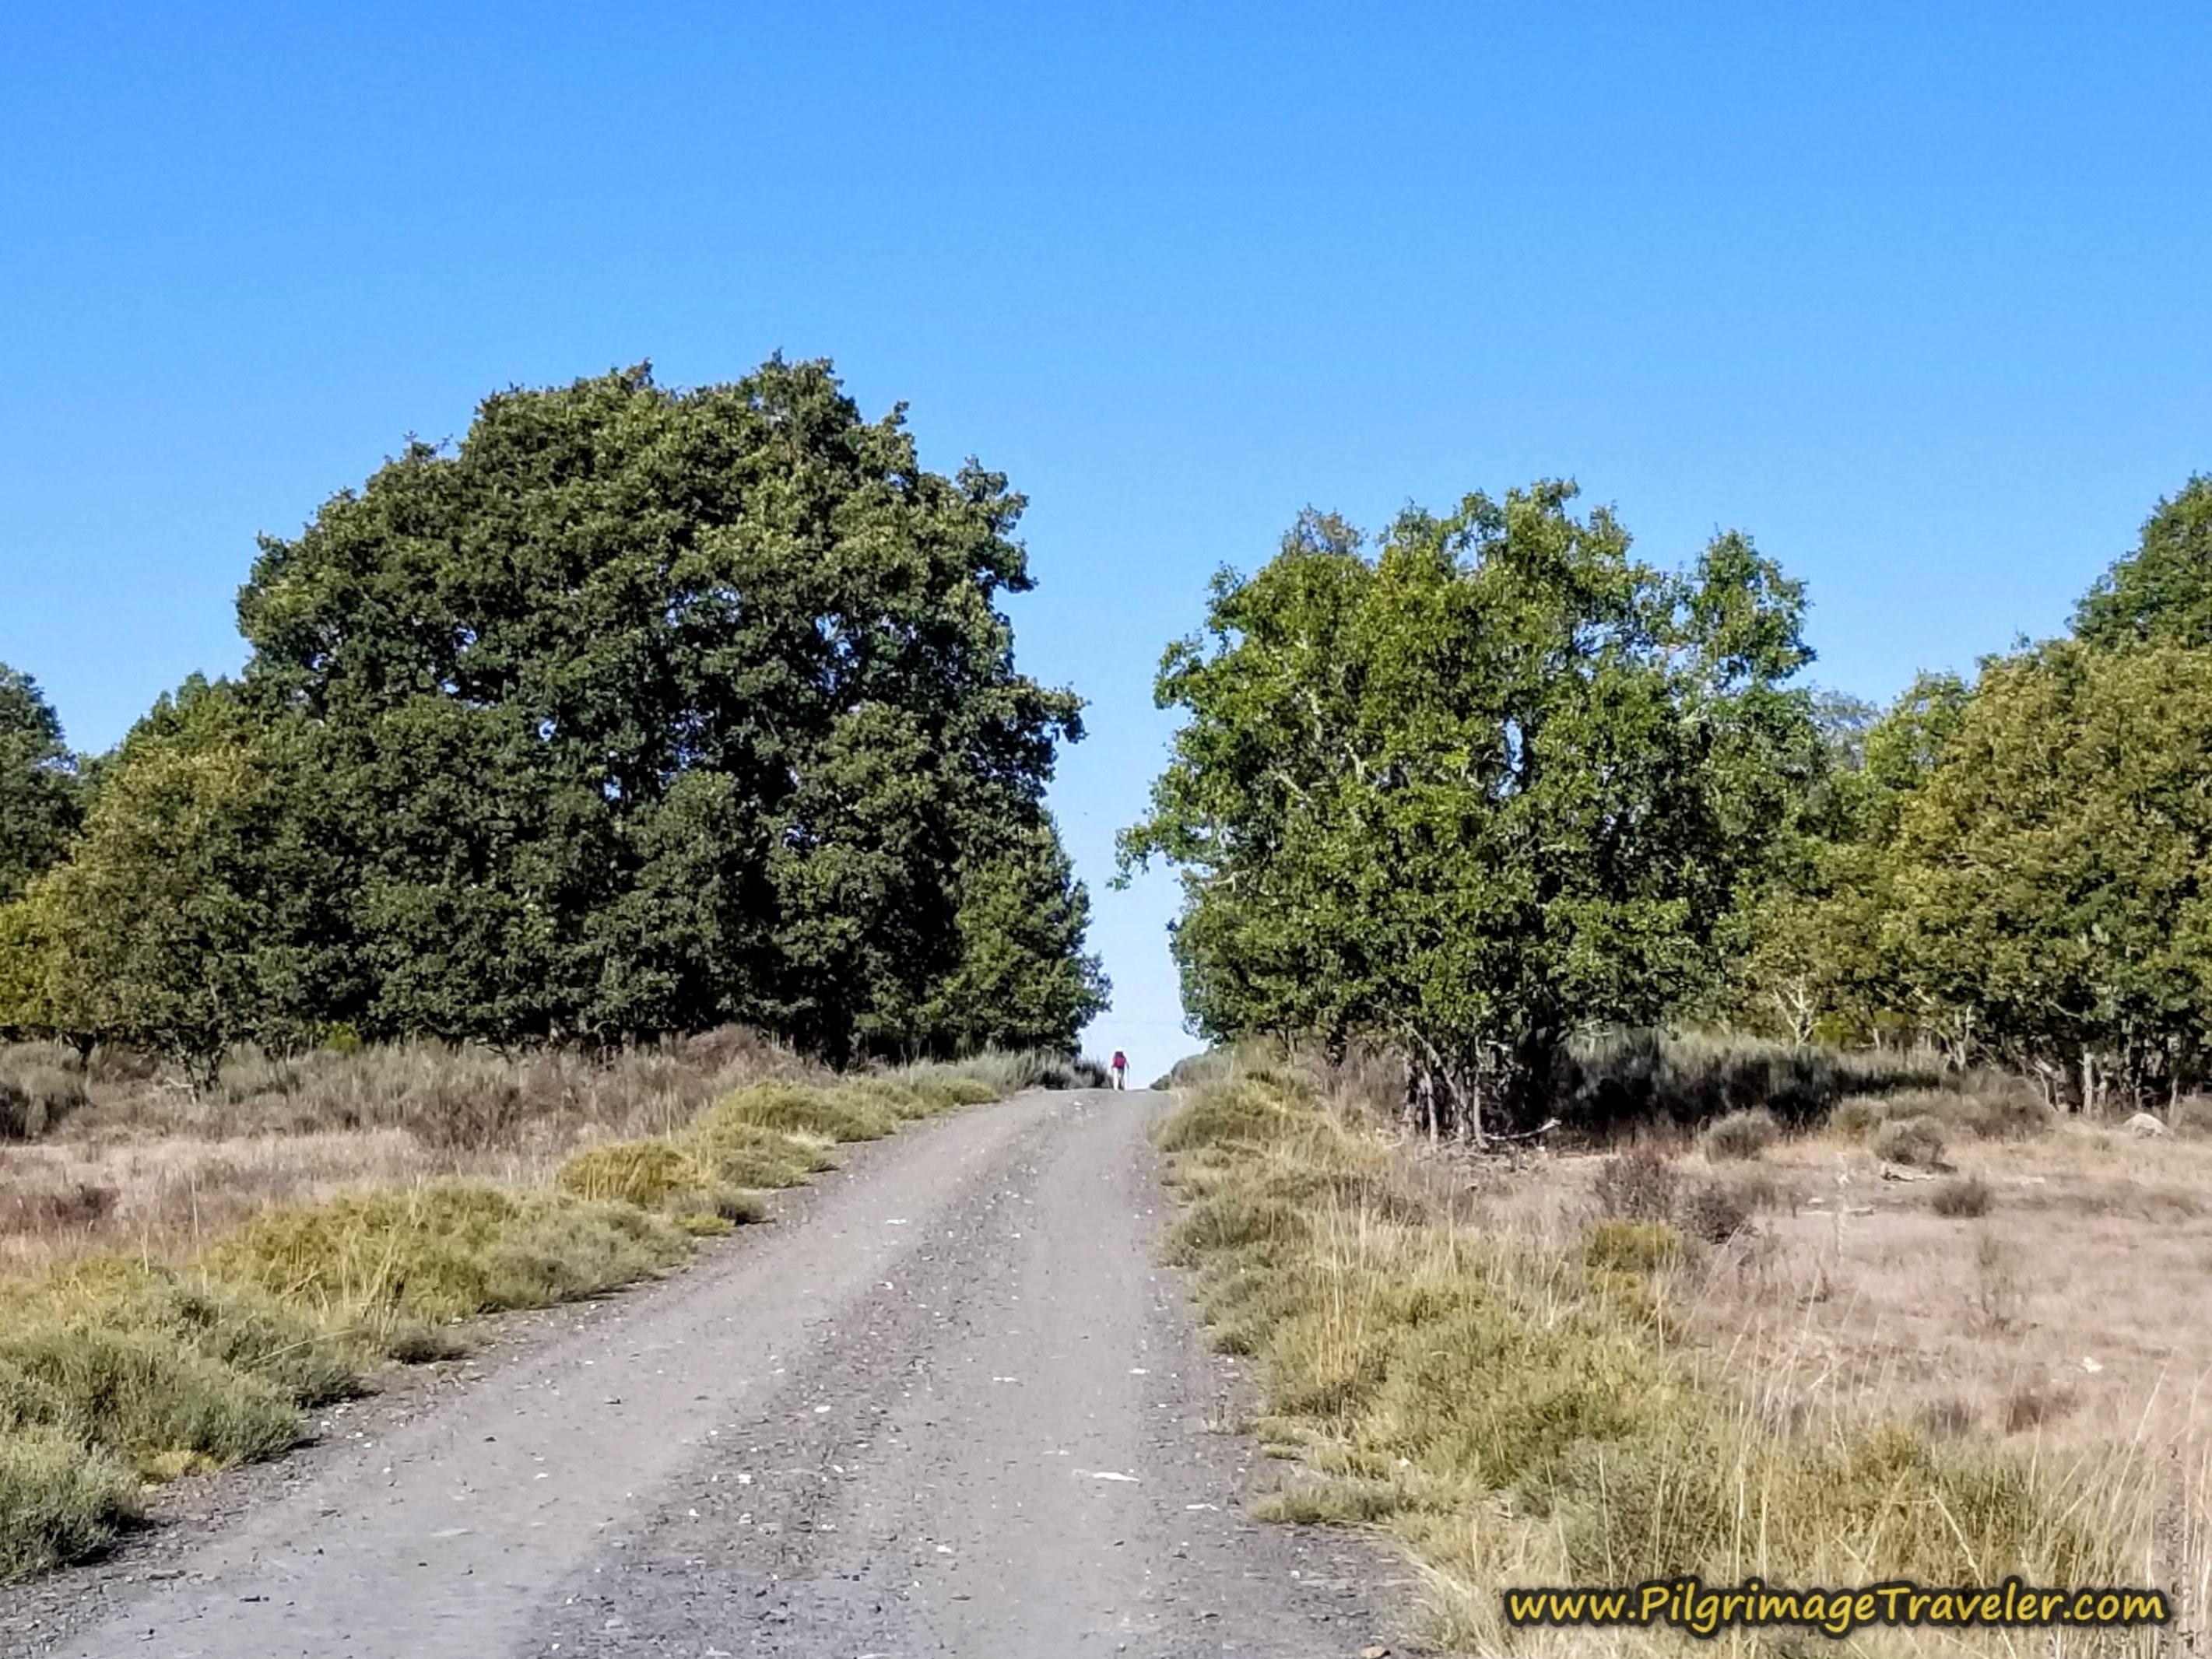 Day Four ~ Rionegro del Puente to Entrepeñas, 22.9 Kilometers (14.23 Miles)